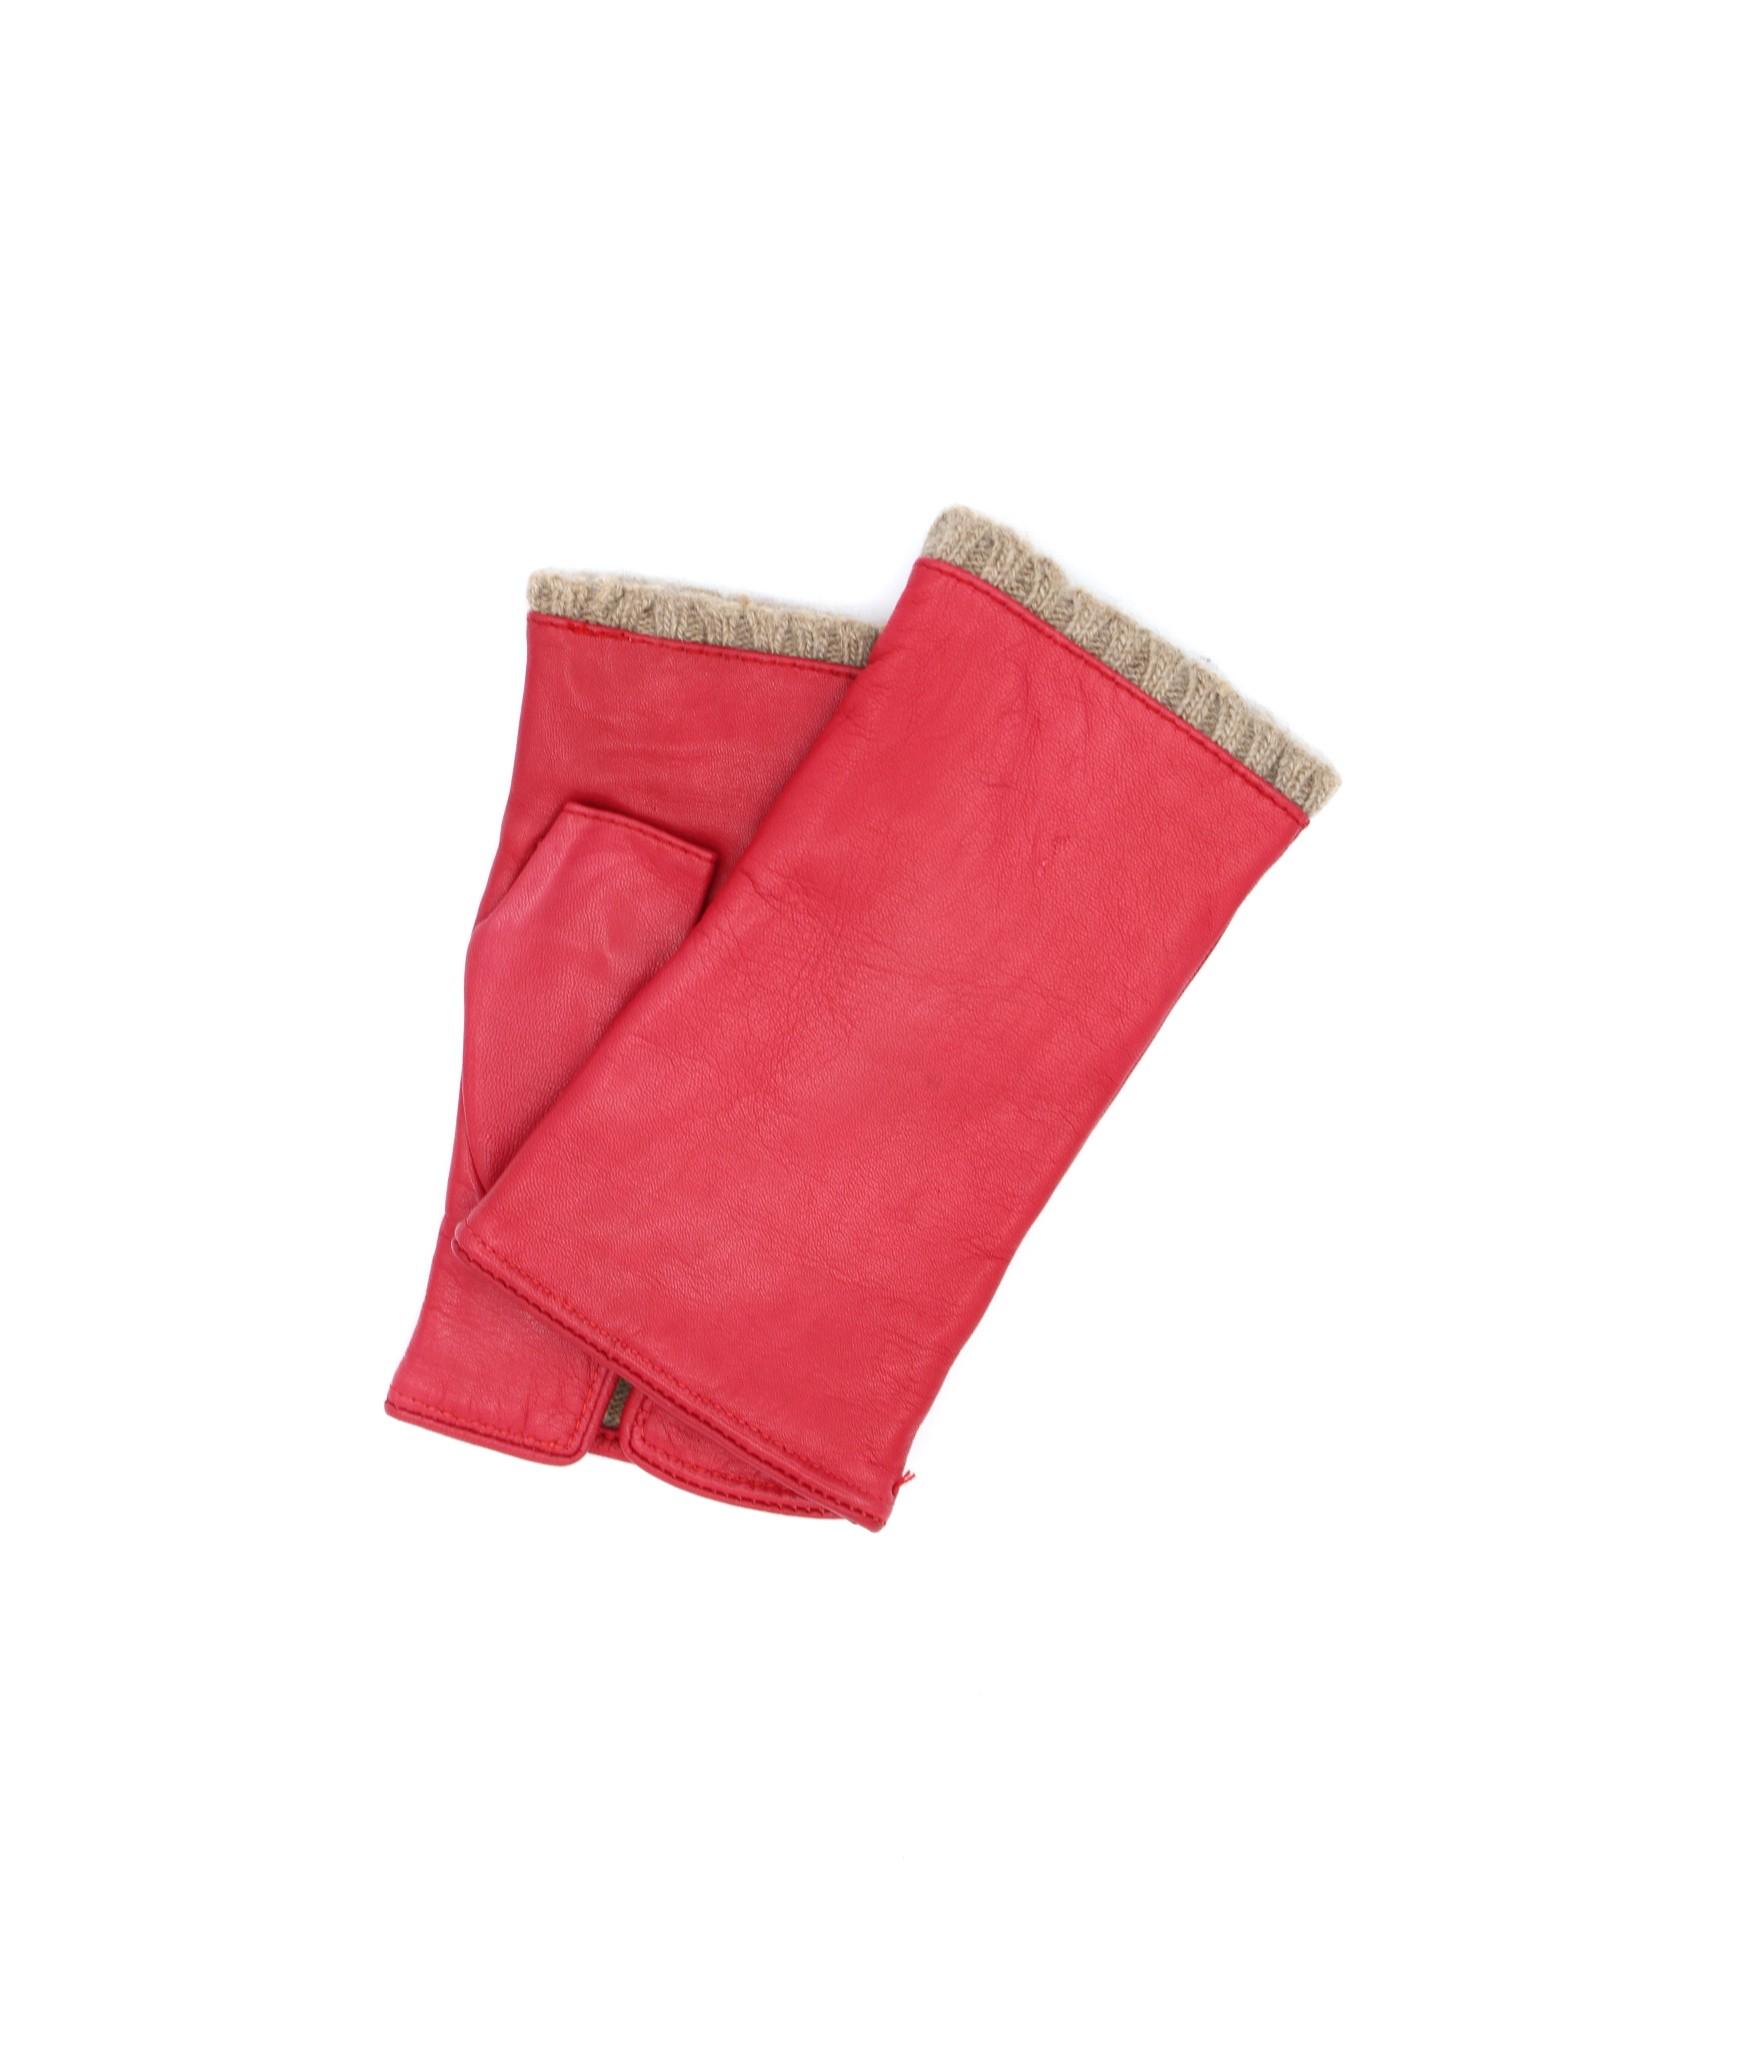 Half Mitten in Nappa leather cashmere lined Red Sermoneta